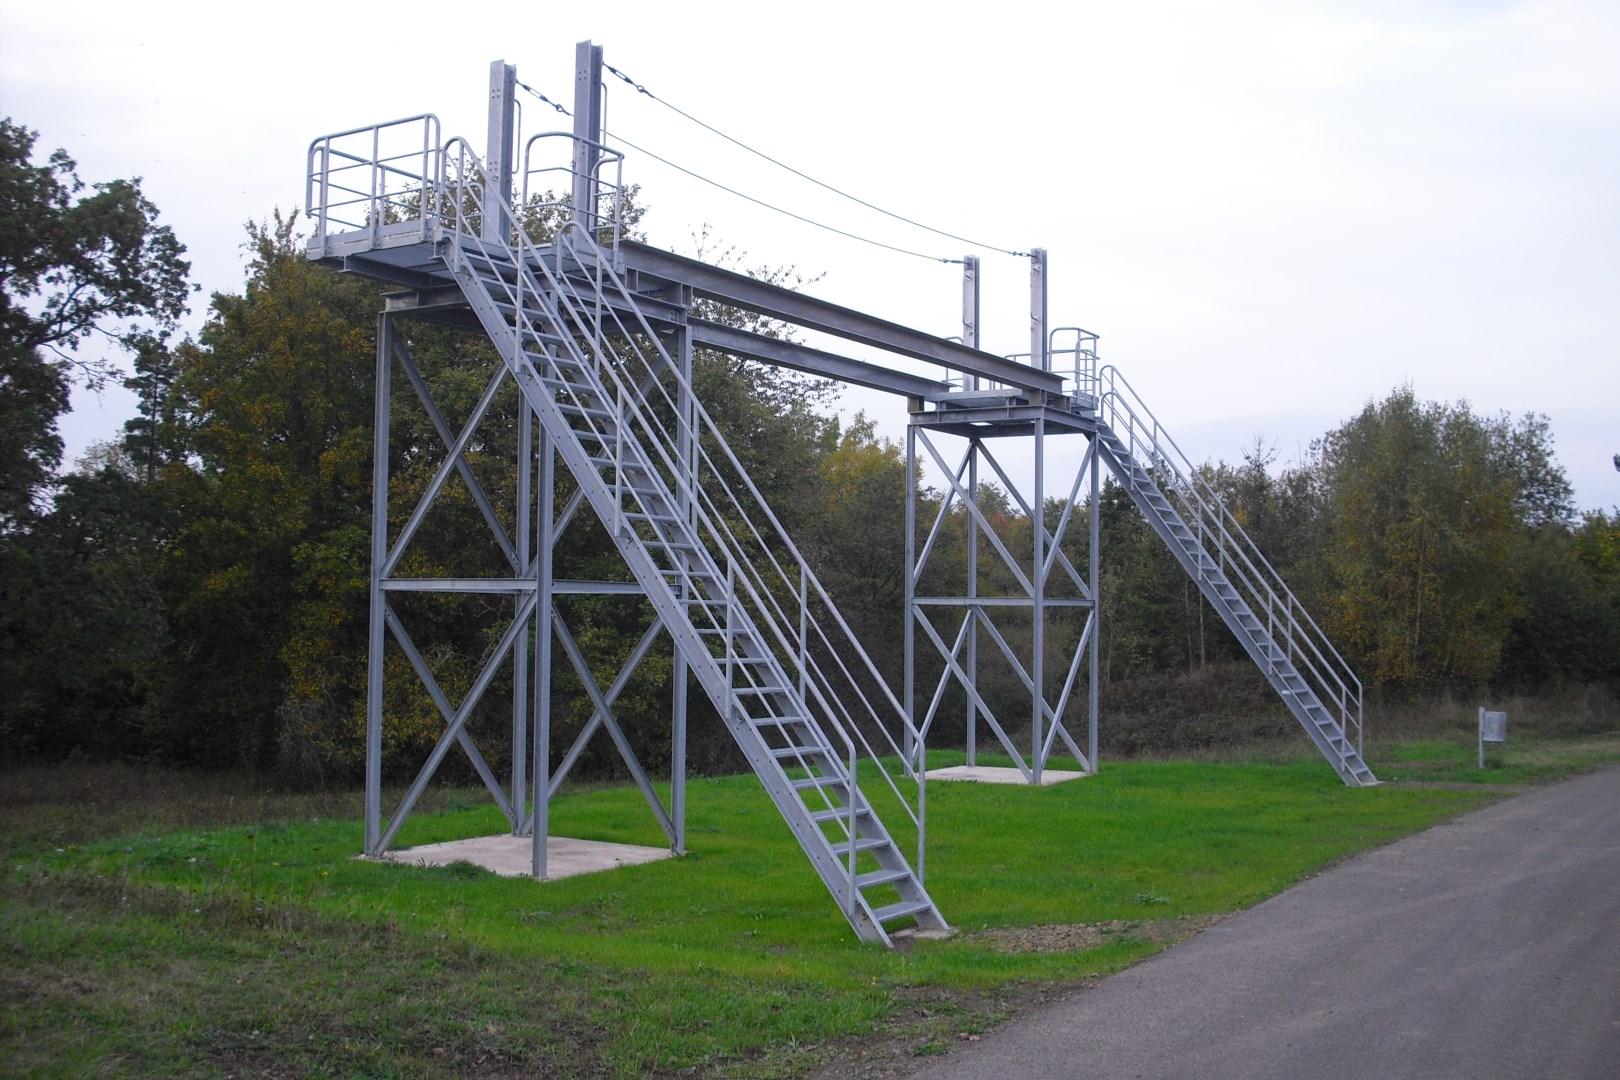 Hindernisbahn-Bundeswehr-5.JPG